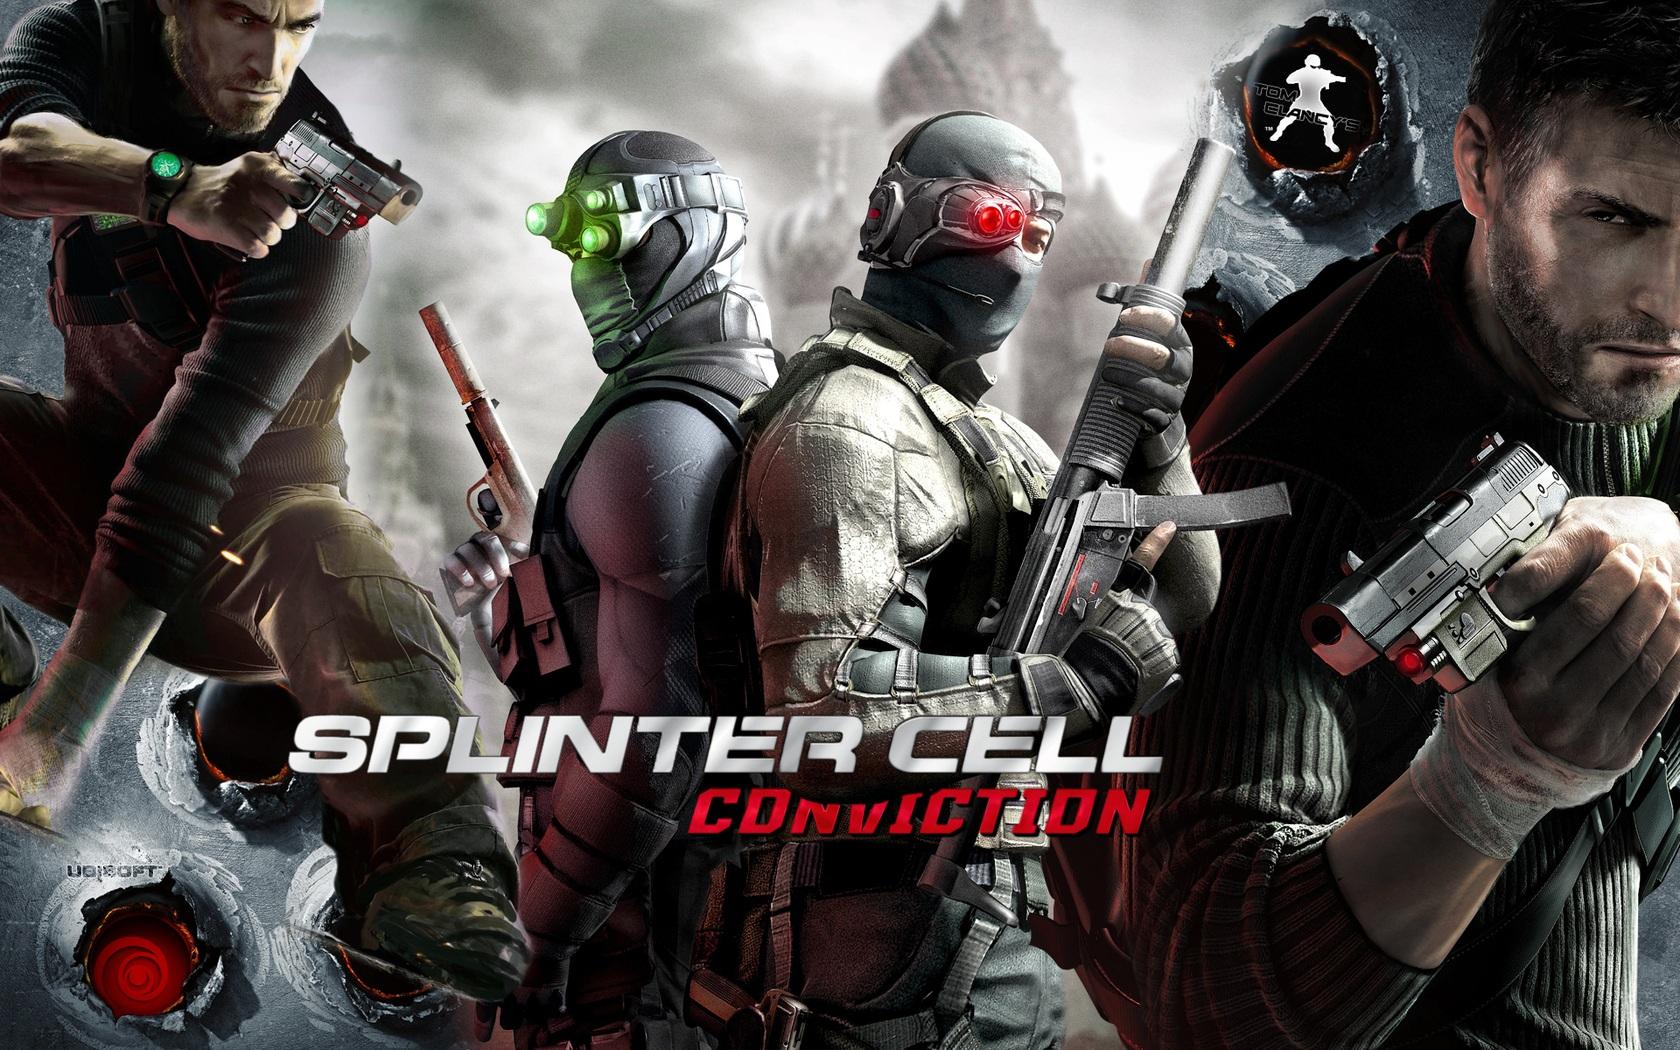 Wallpaper Tom Clancy Splinter Cell Conviction 1680x1050 Hd